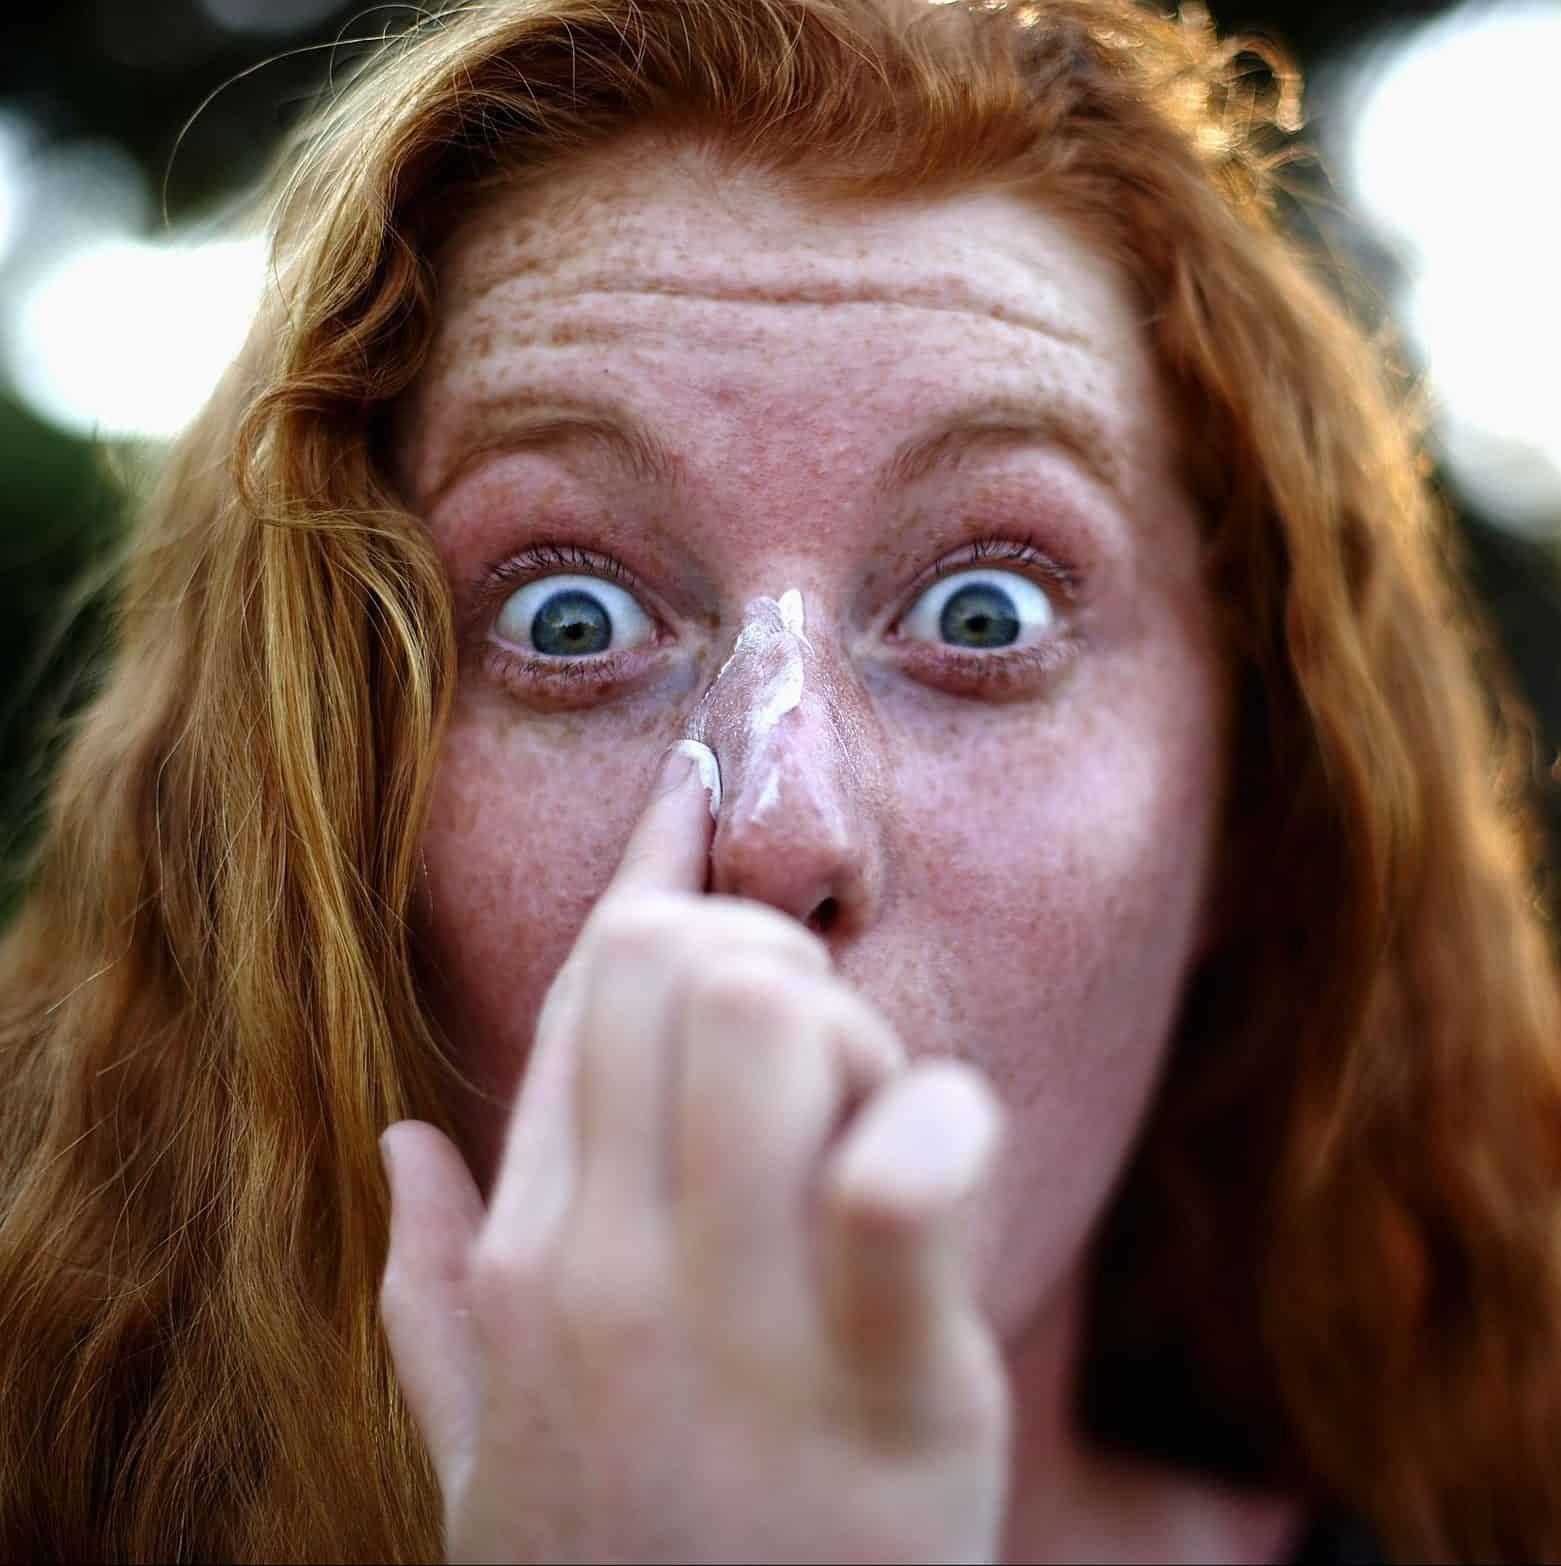 young-woman-putting-sunscreen-on-nose-5c243a4746e0fb0001e76aad-e1592832498960-1766710